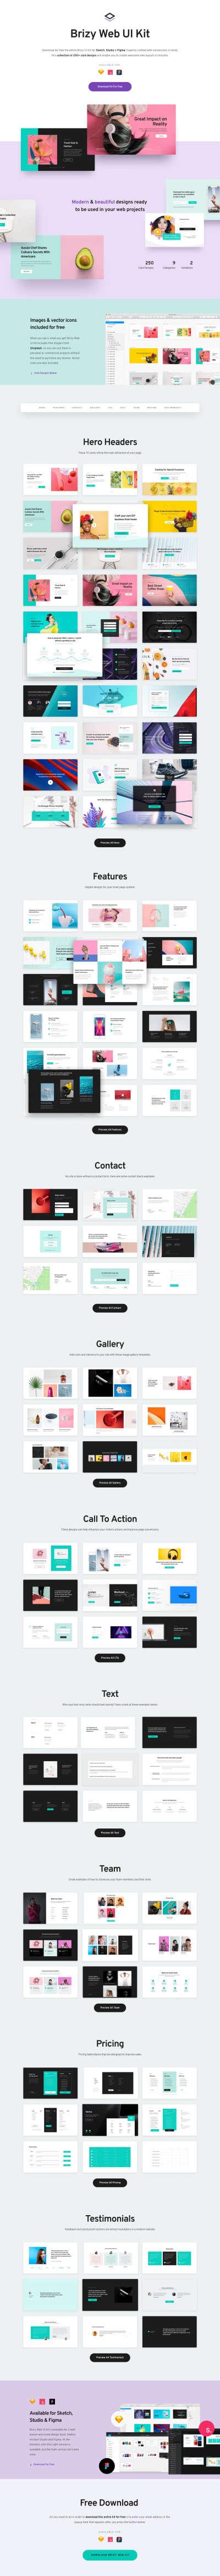 Brizy Web UI Kit for Figma